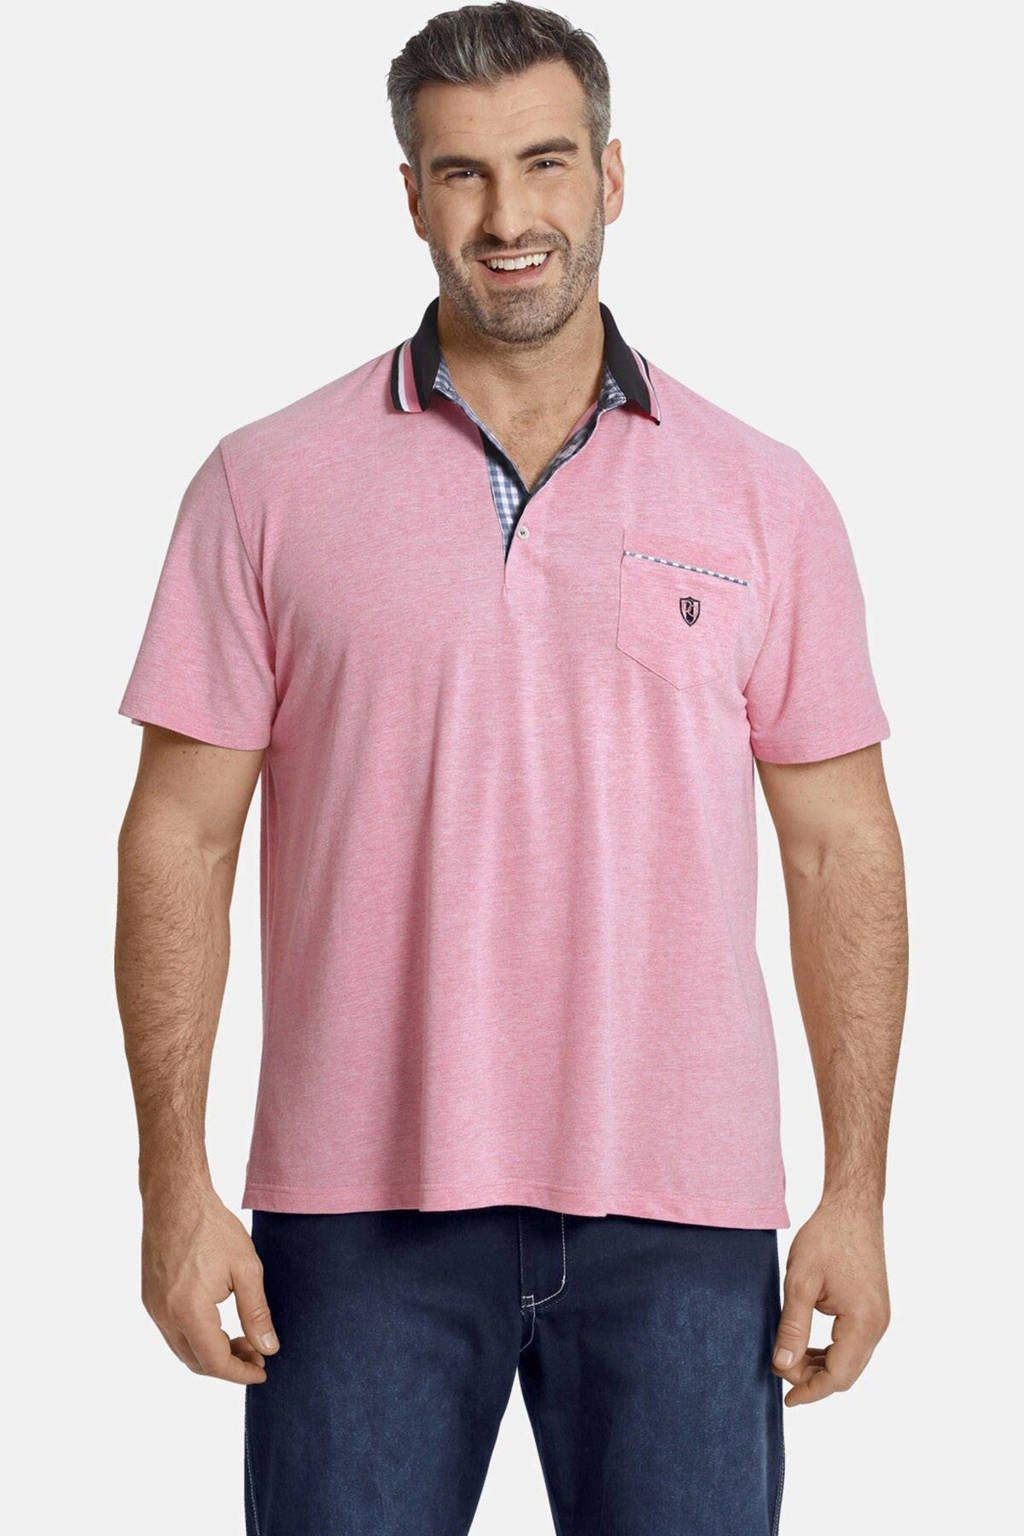 Charles Colby oversized polo EARL ZEON Plus Size met logo roze, Roze